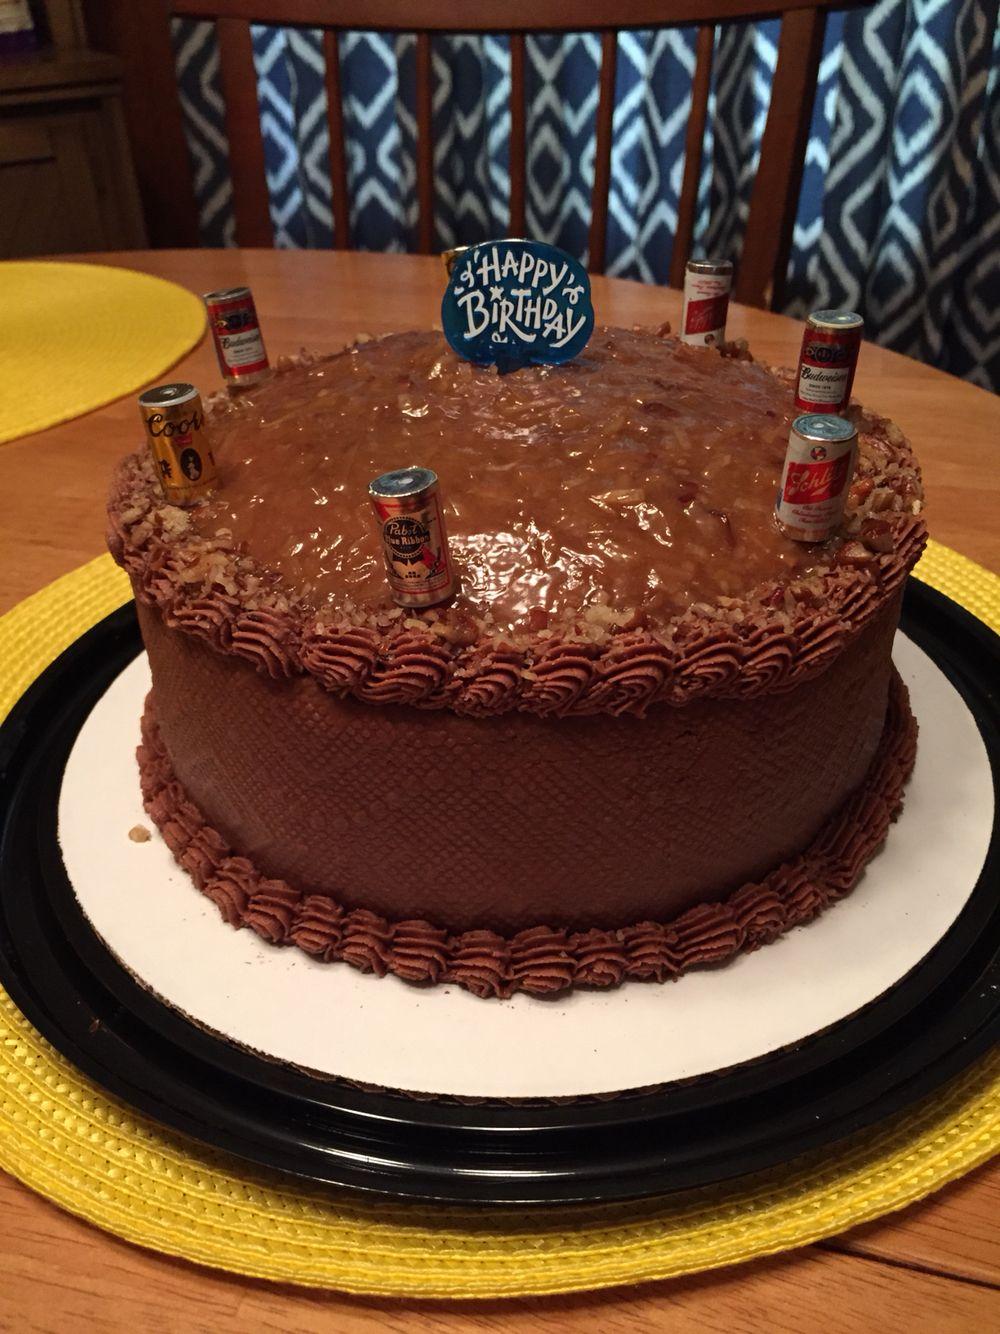 Happy birthday German chocolate cake 7.3.15 | HOME BAKED Cakes